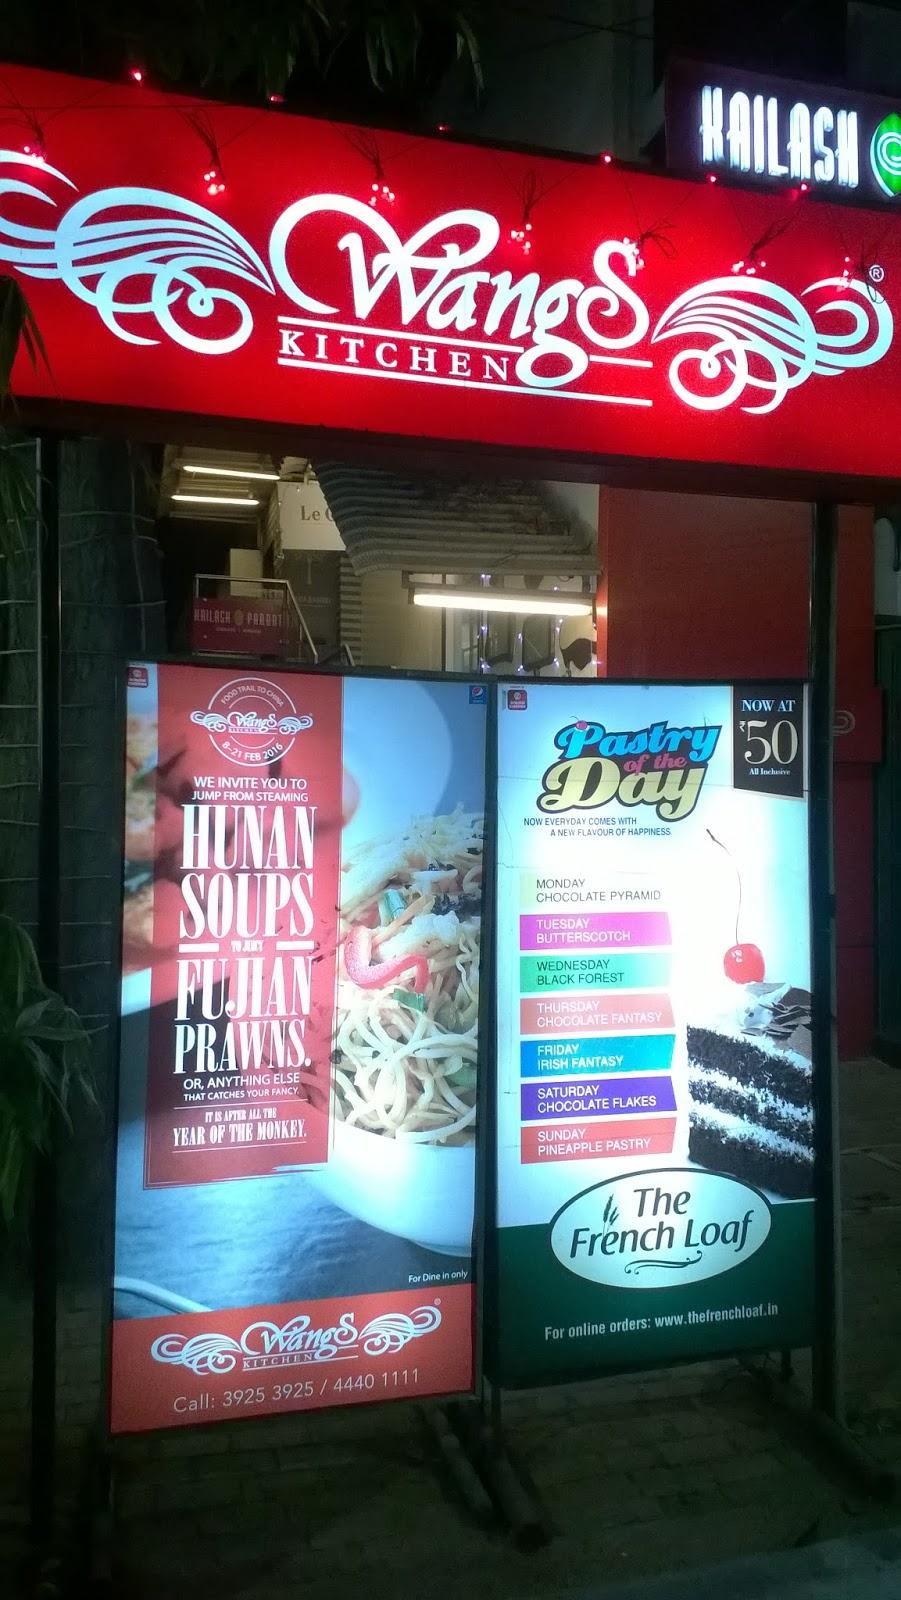 foo d octor wangs kitchen gang fa si cai special menu